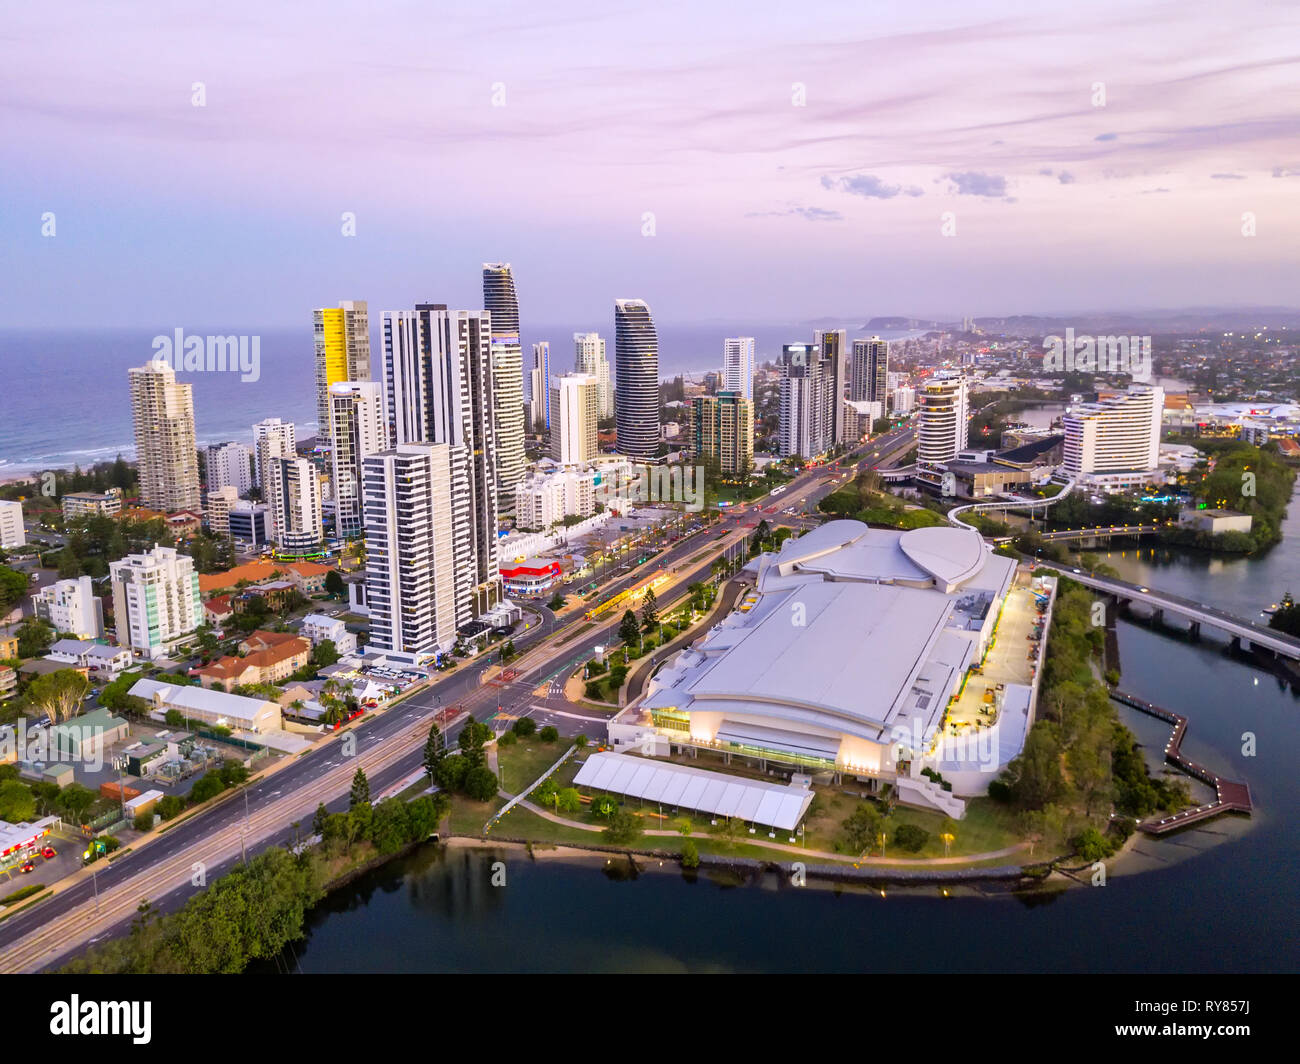 Star city casino stock price per